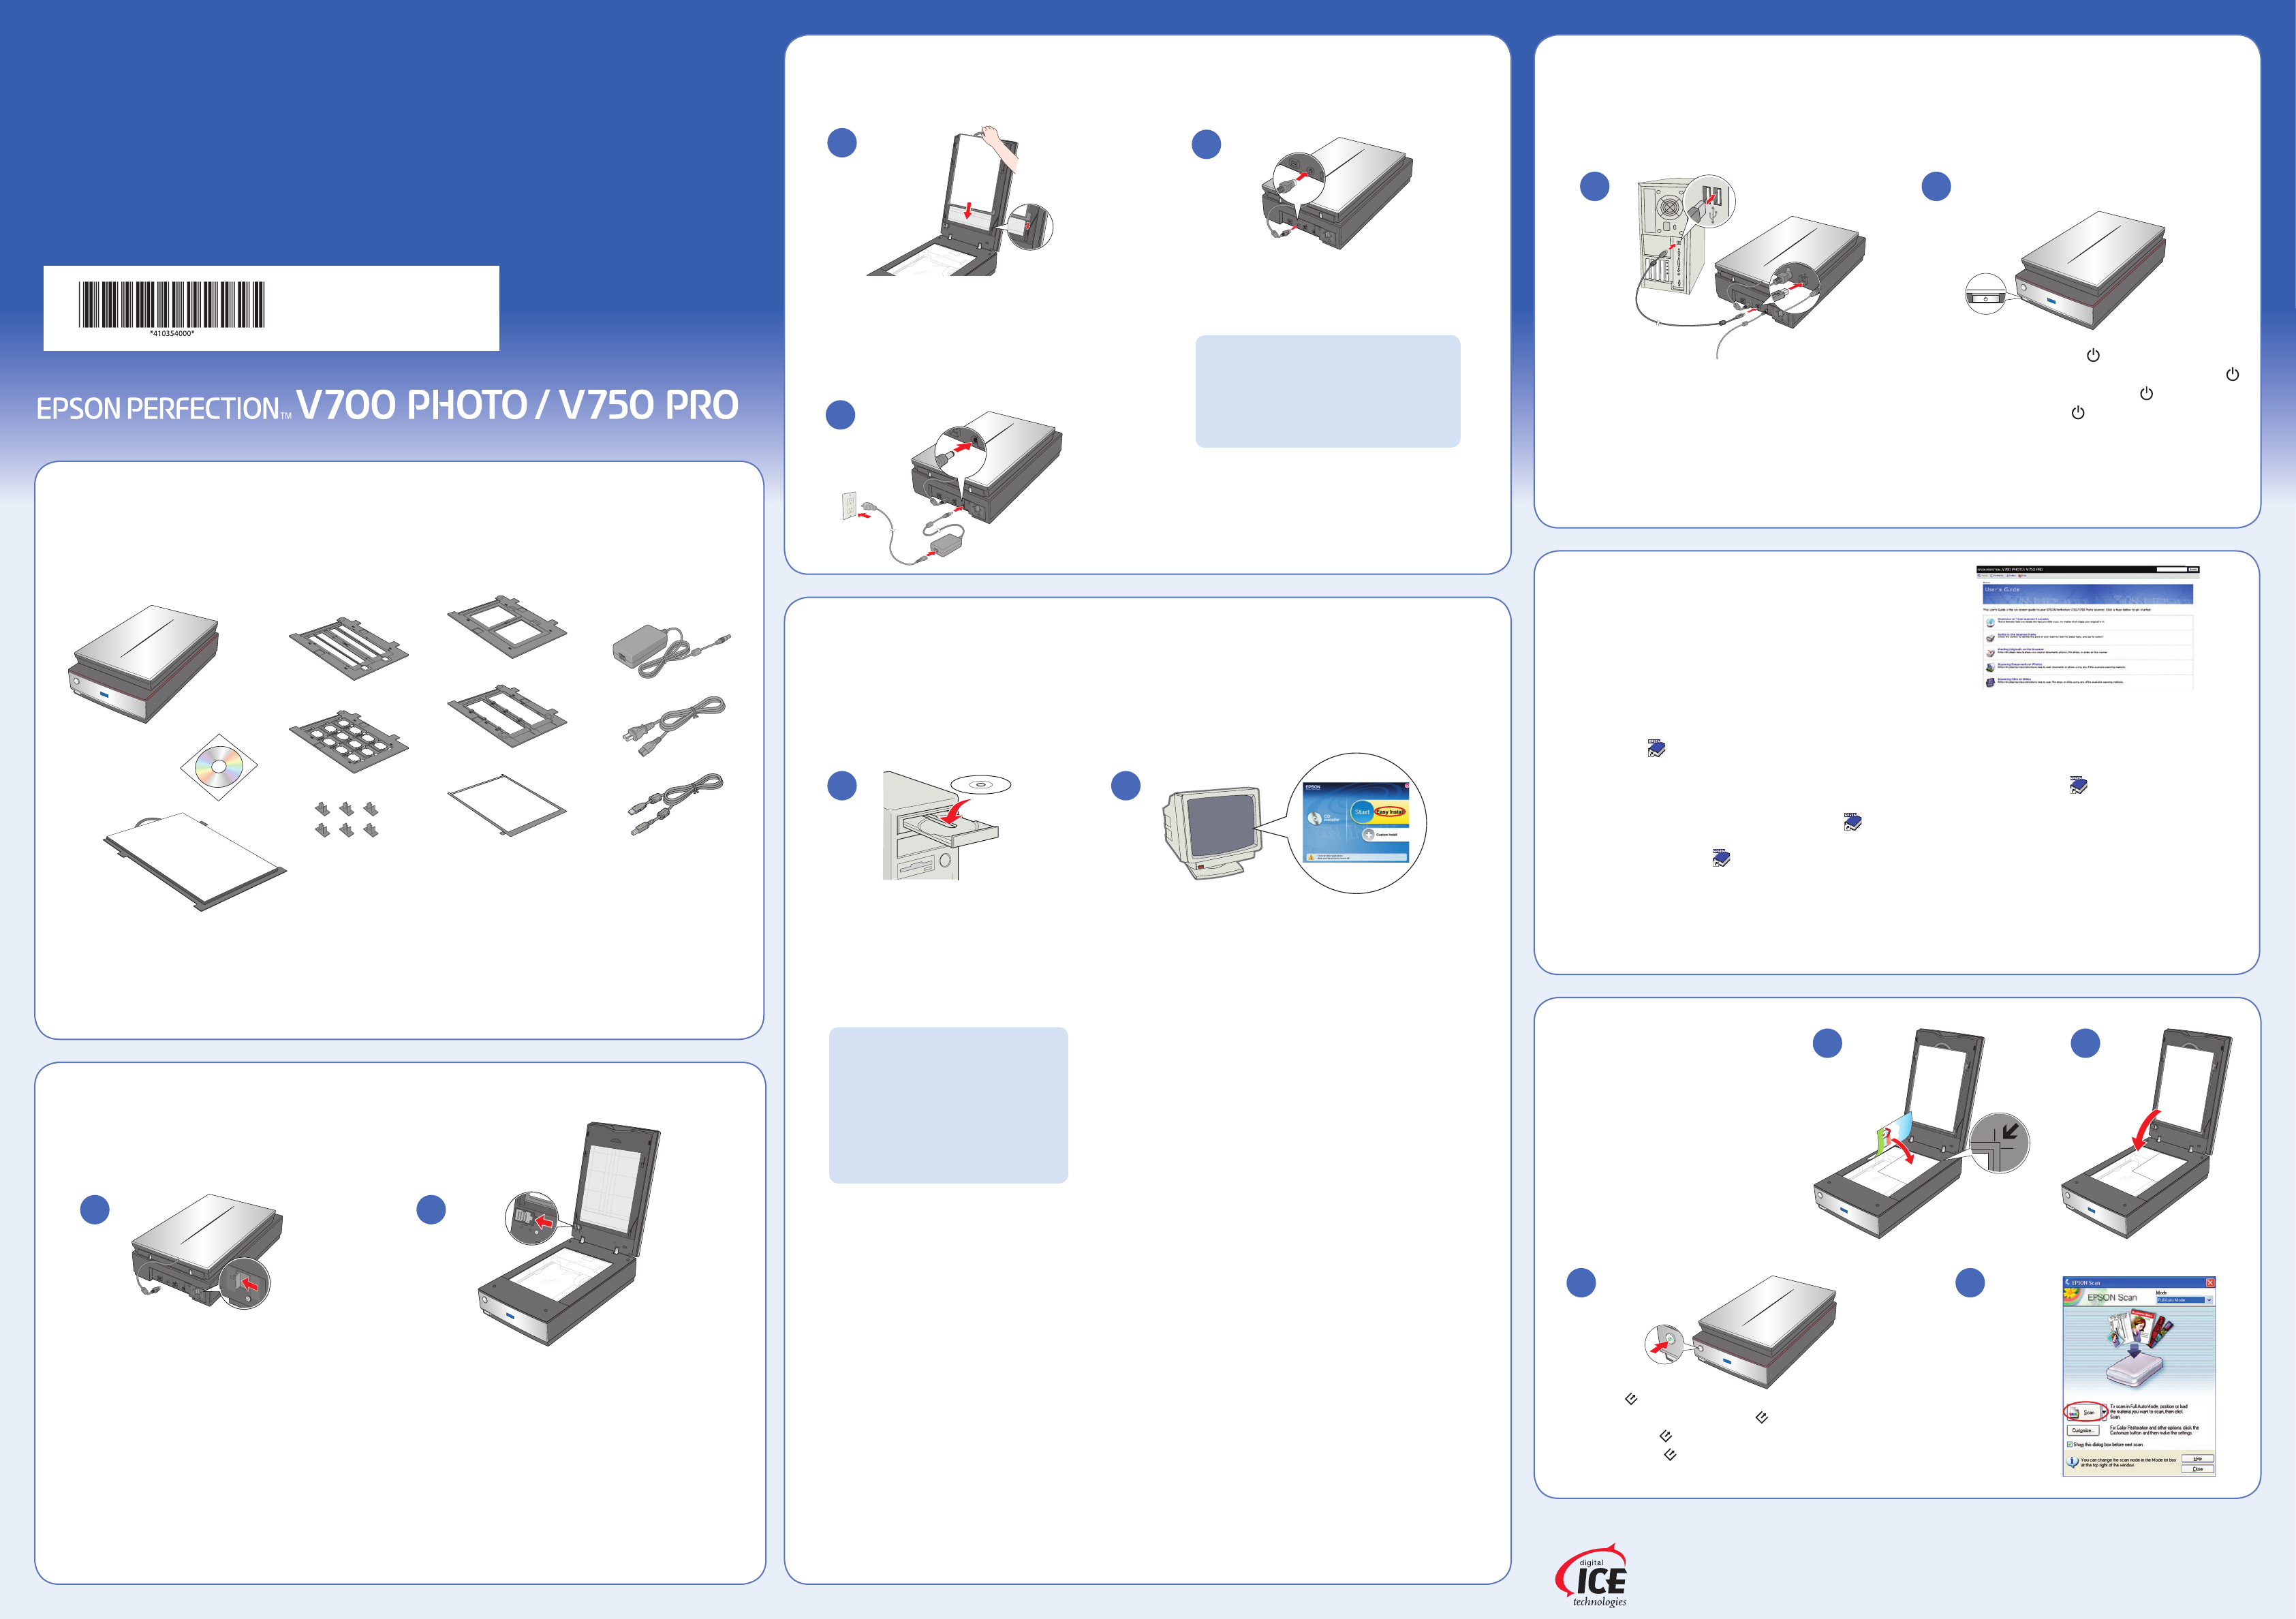 epson xp 235 scanning instructions